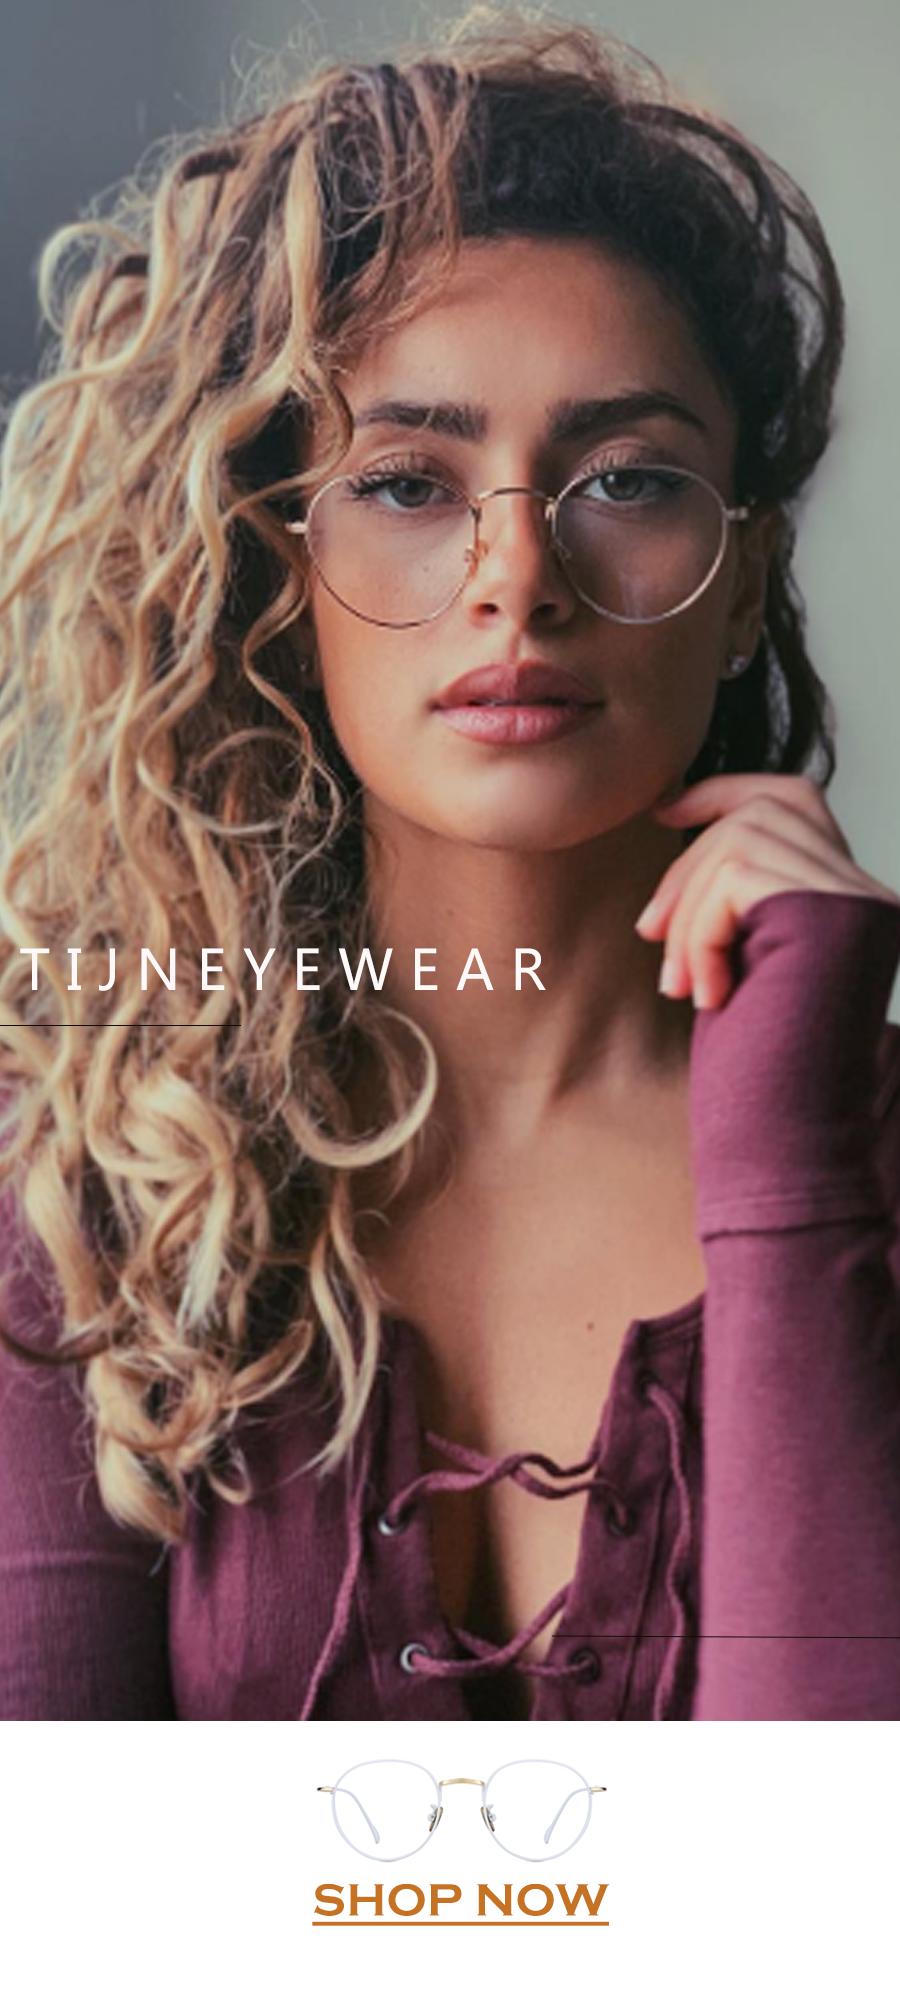 1f75b83309 Eyewear Trends Women NEW Fashion. You may get a new look.Top sale glasses.   eyewear  fashion eyewear  sunglasses eye